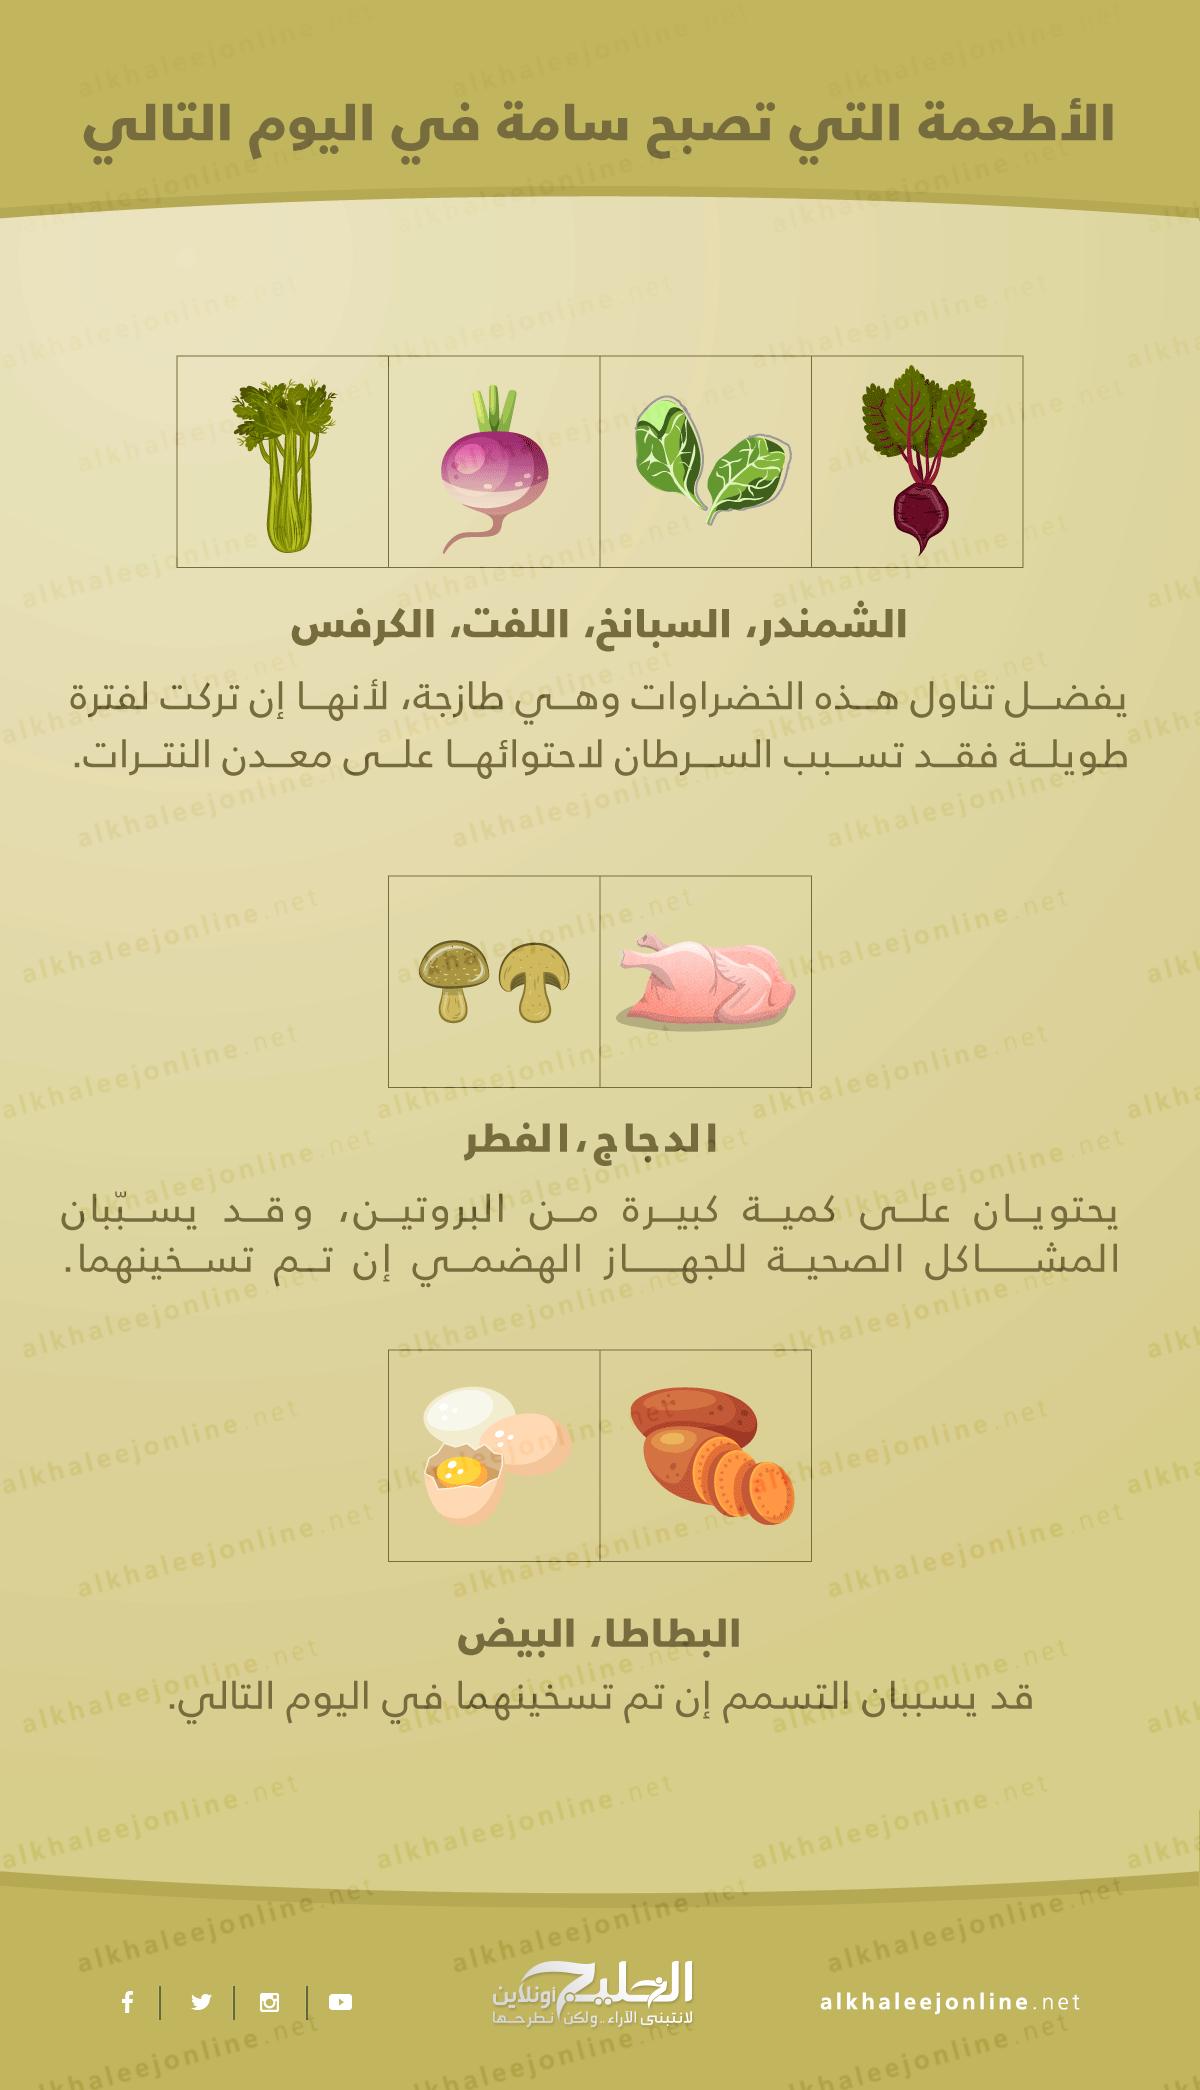 FoodsMayHarm